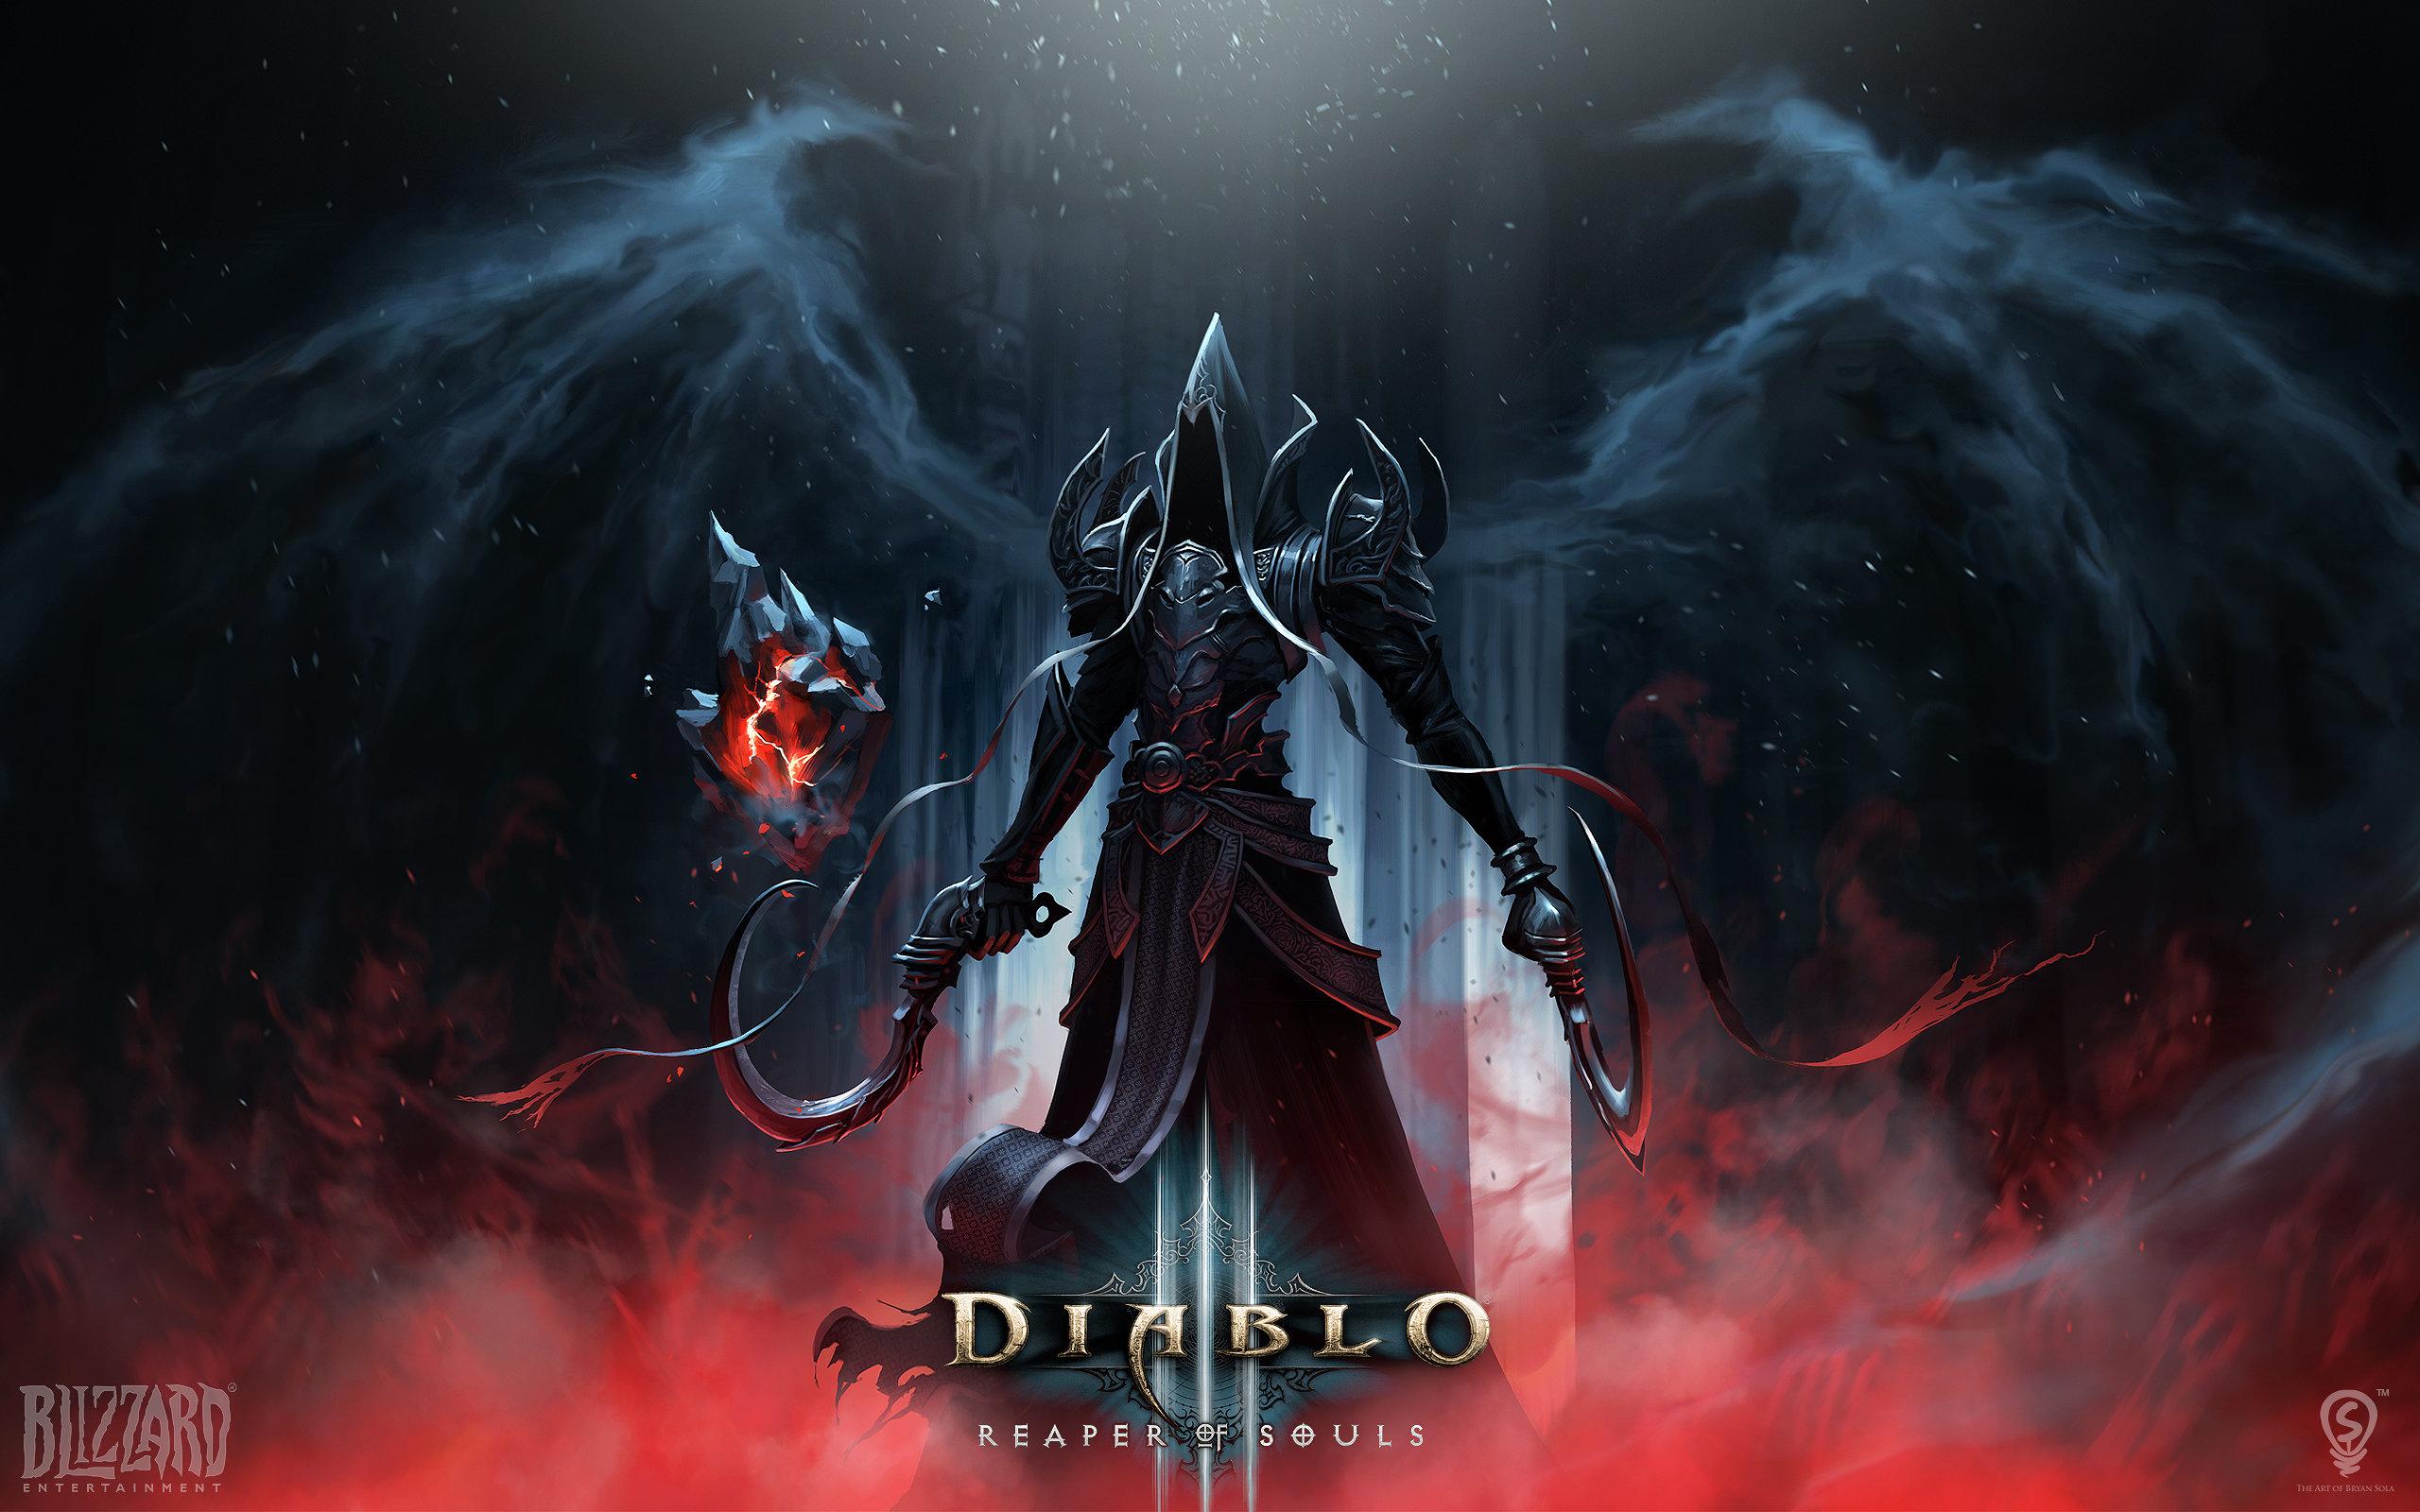 Diablo Patch 2 4 1 PTR Now Live, FARMABLE COSMETICS! - News